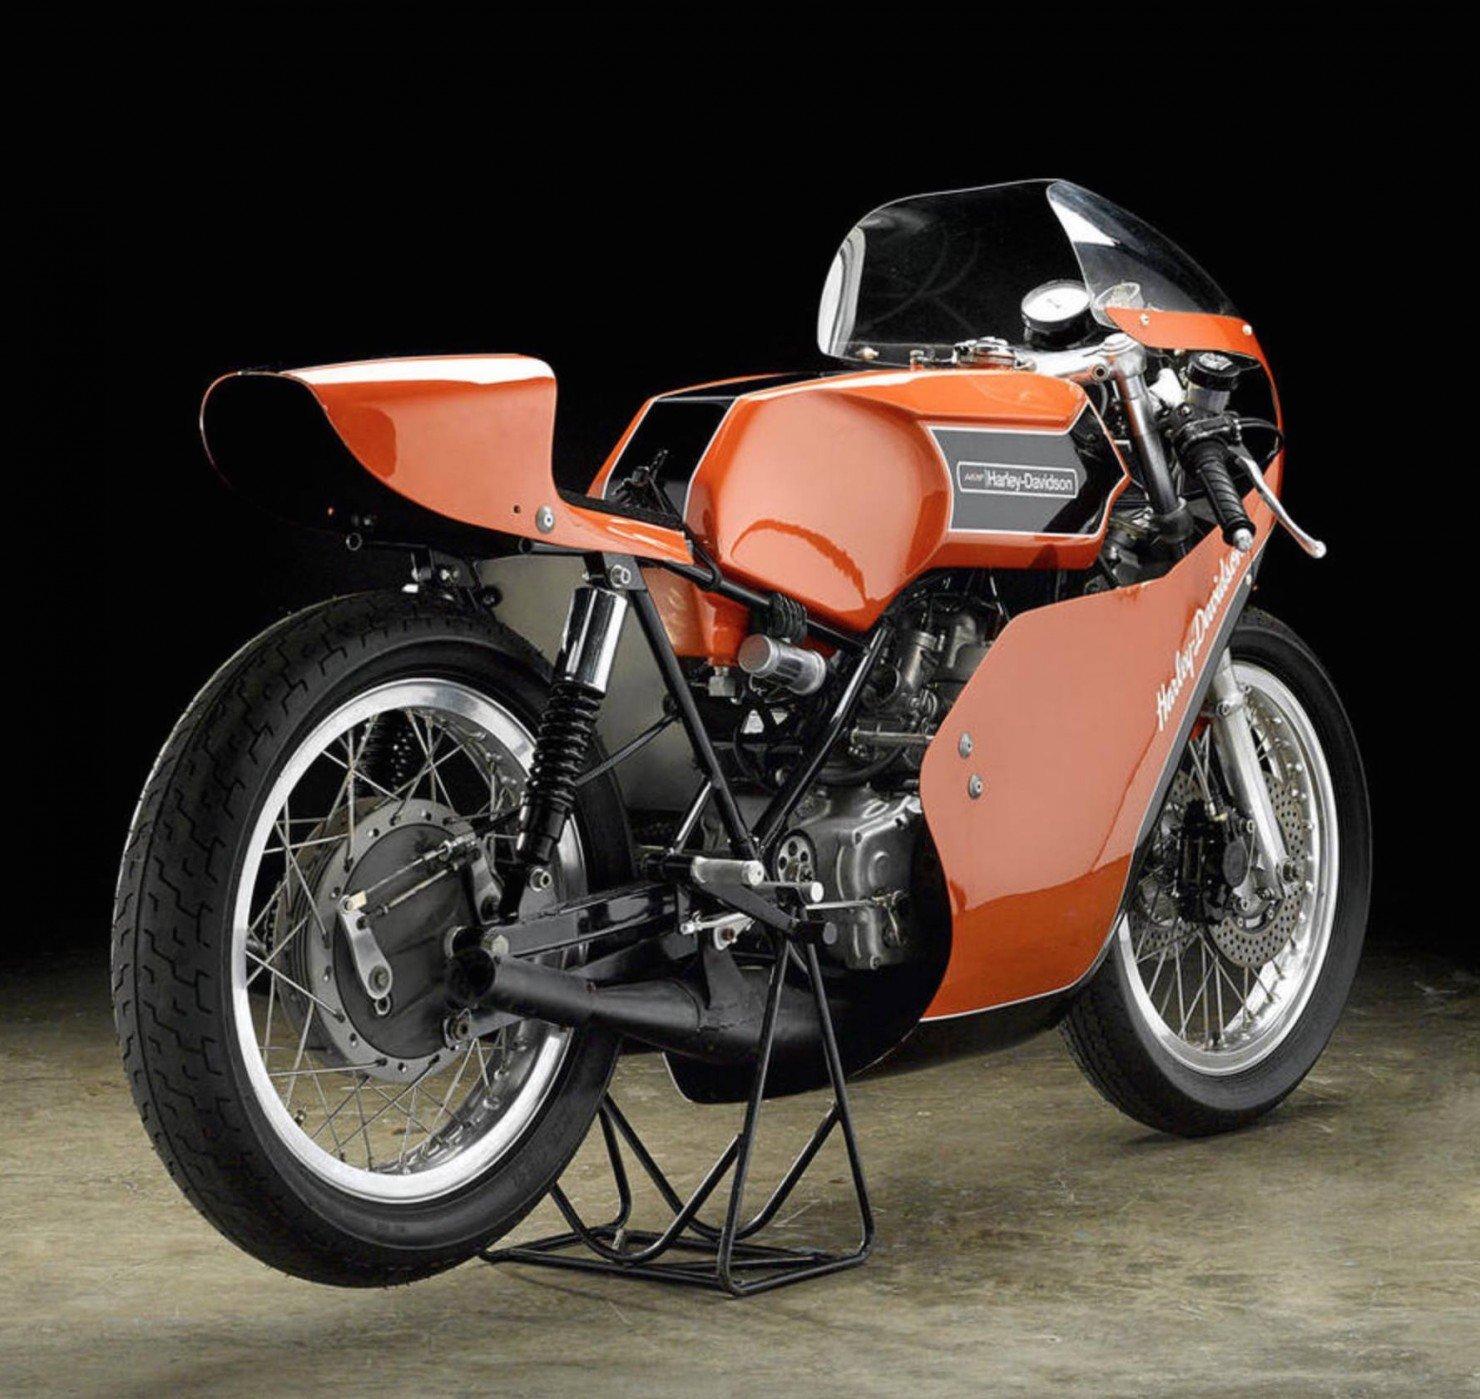 Harley-Davidson RR350 5